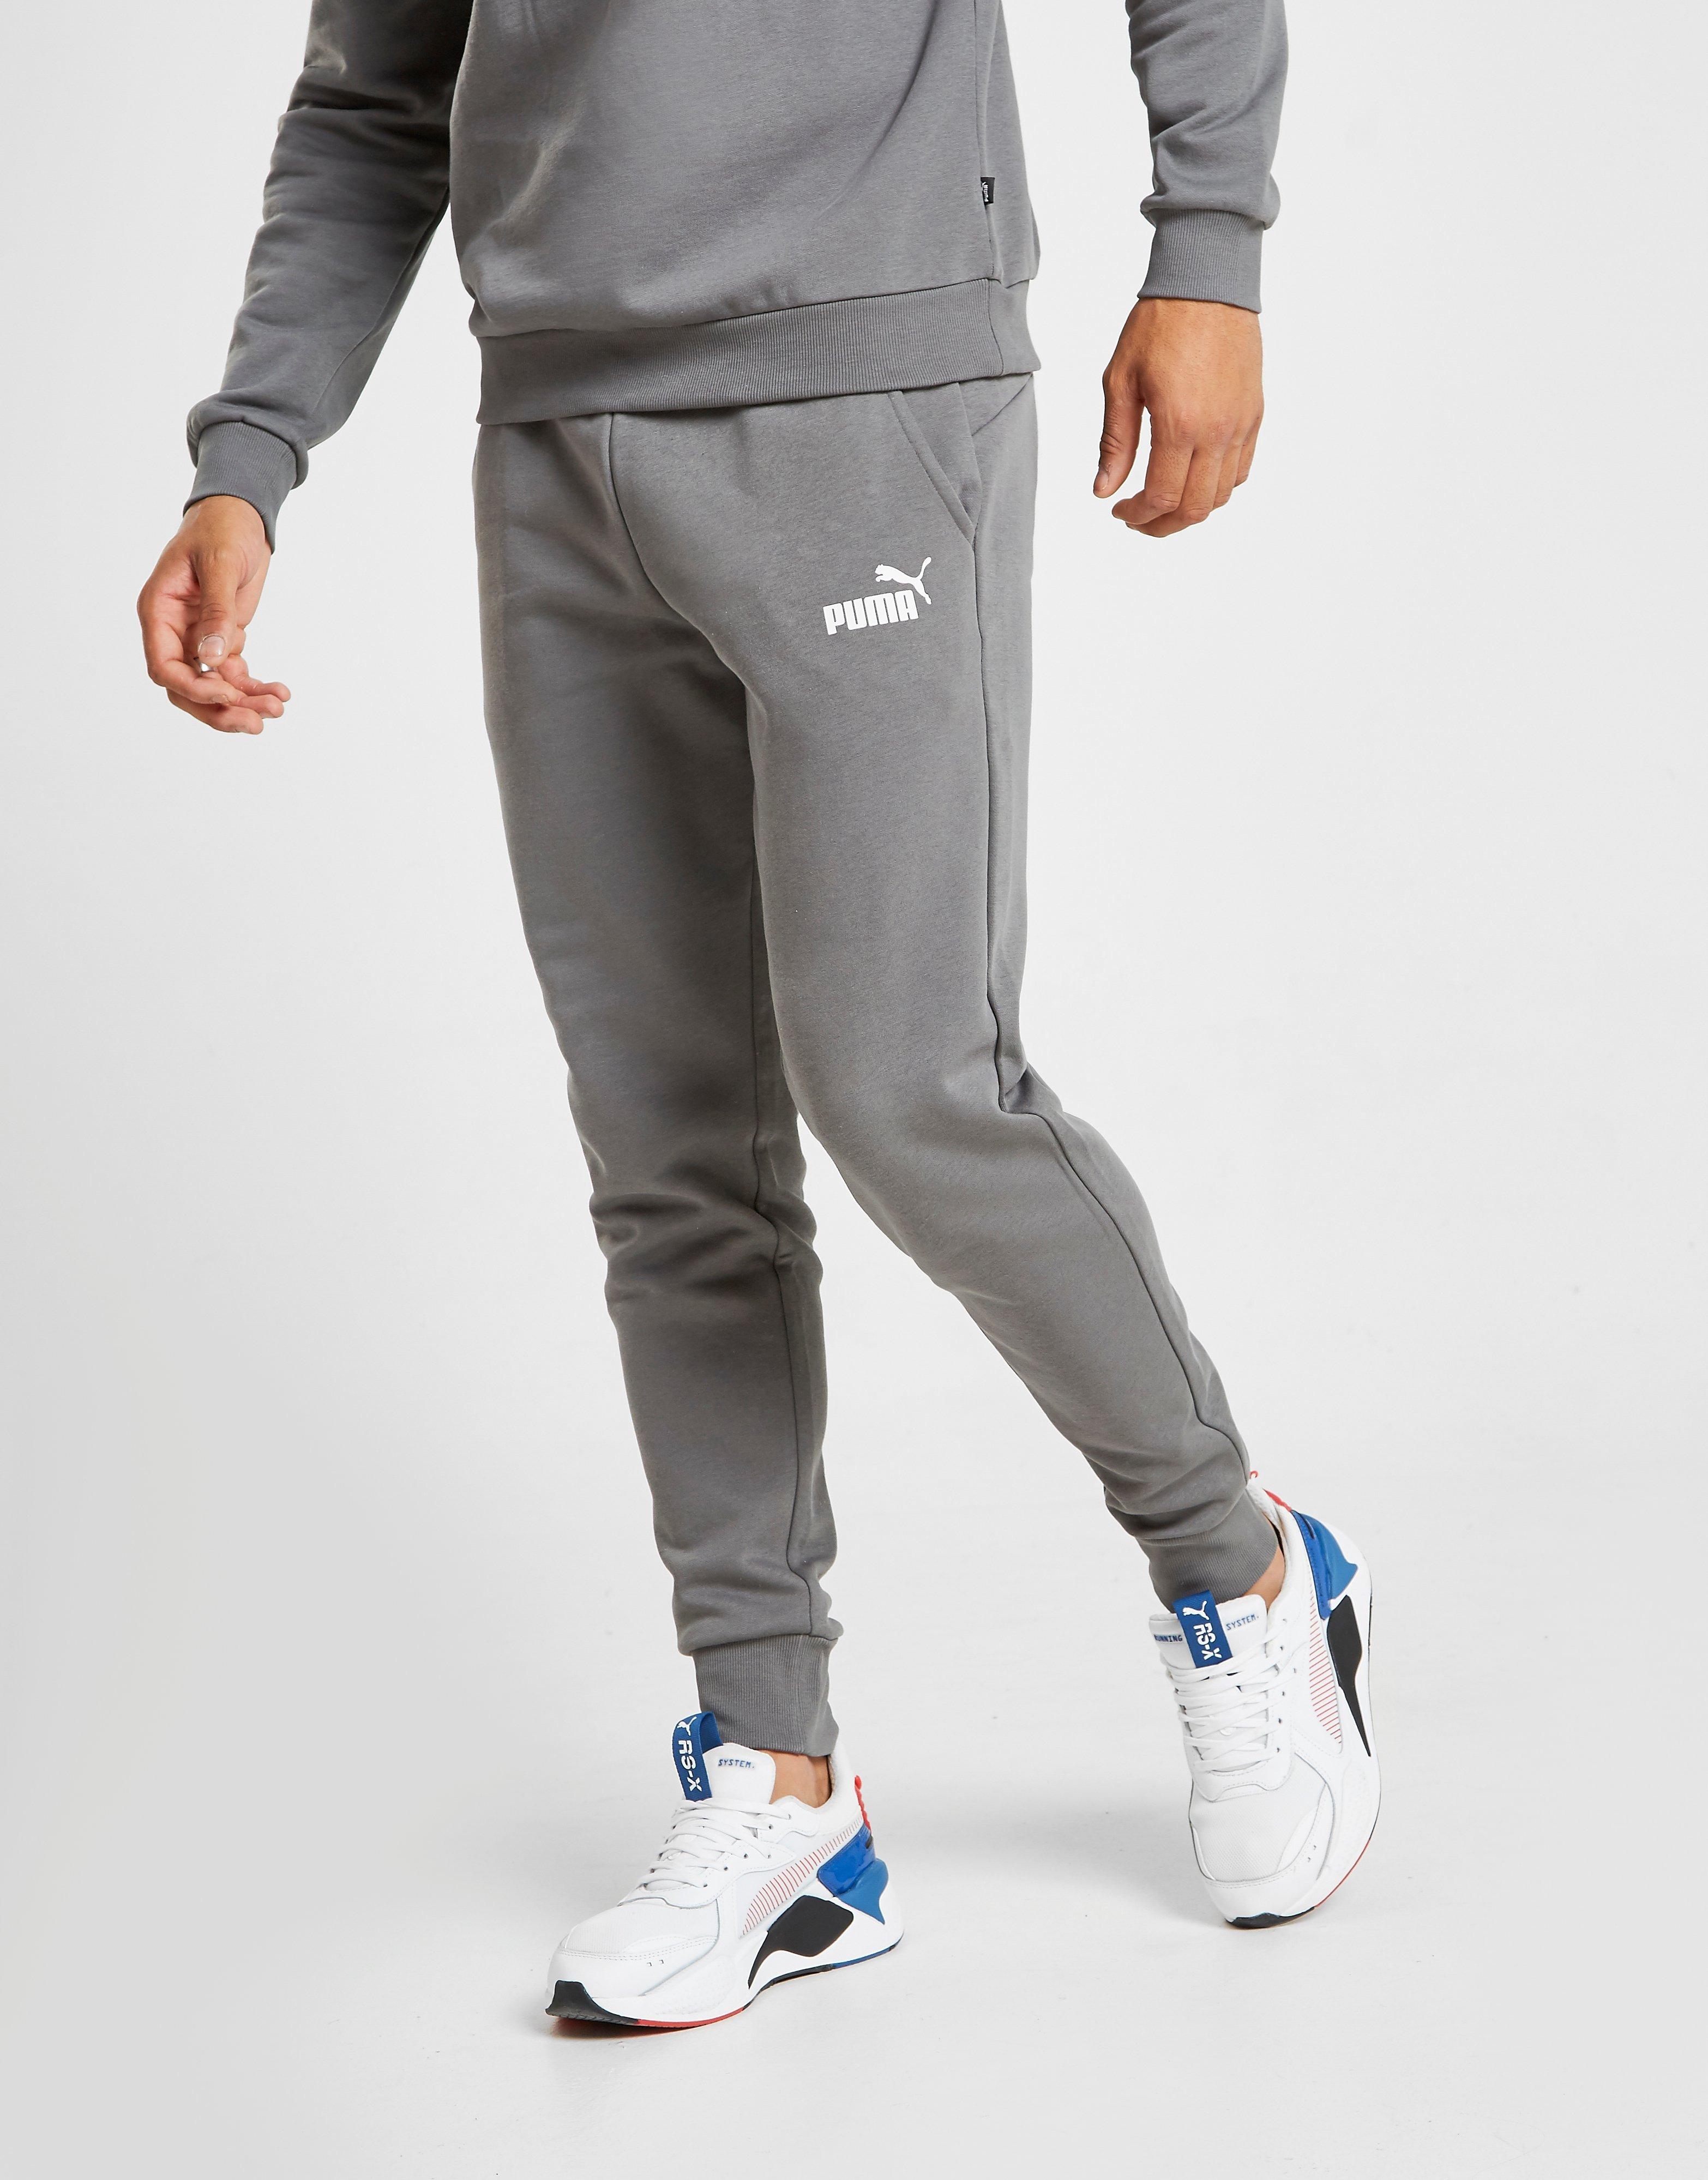 puma joggers